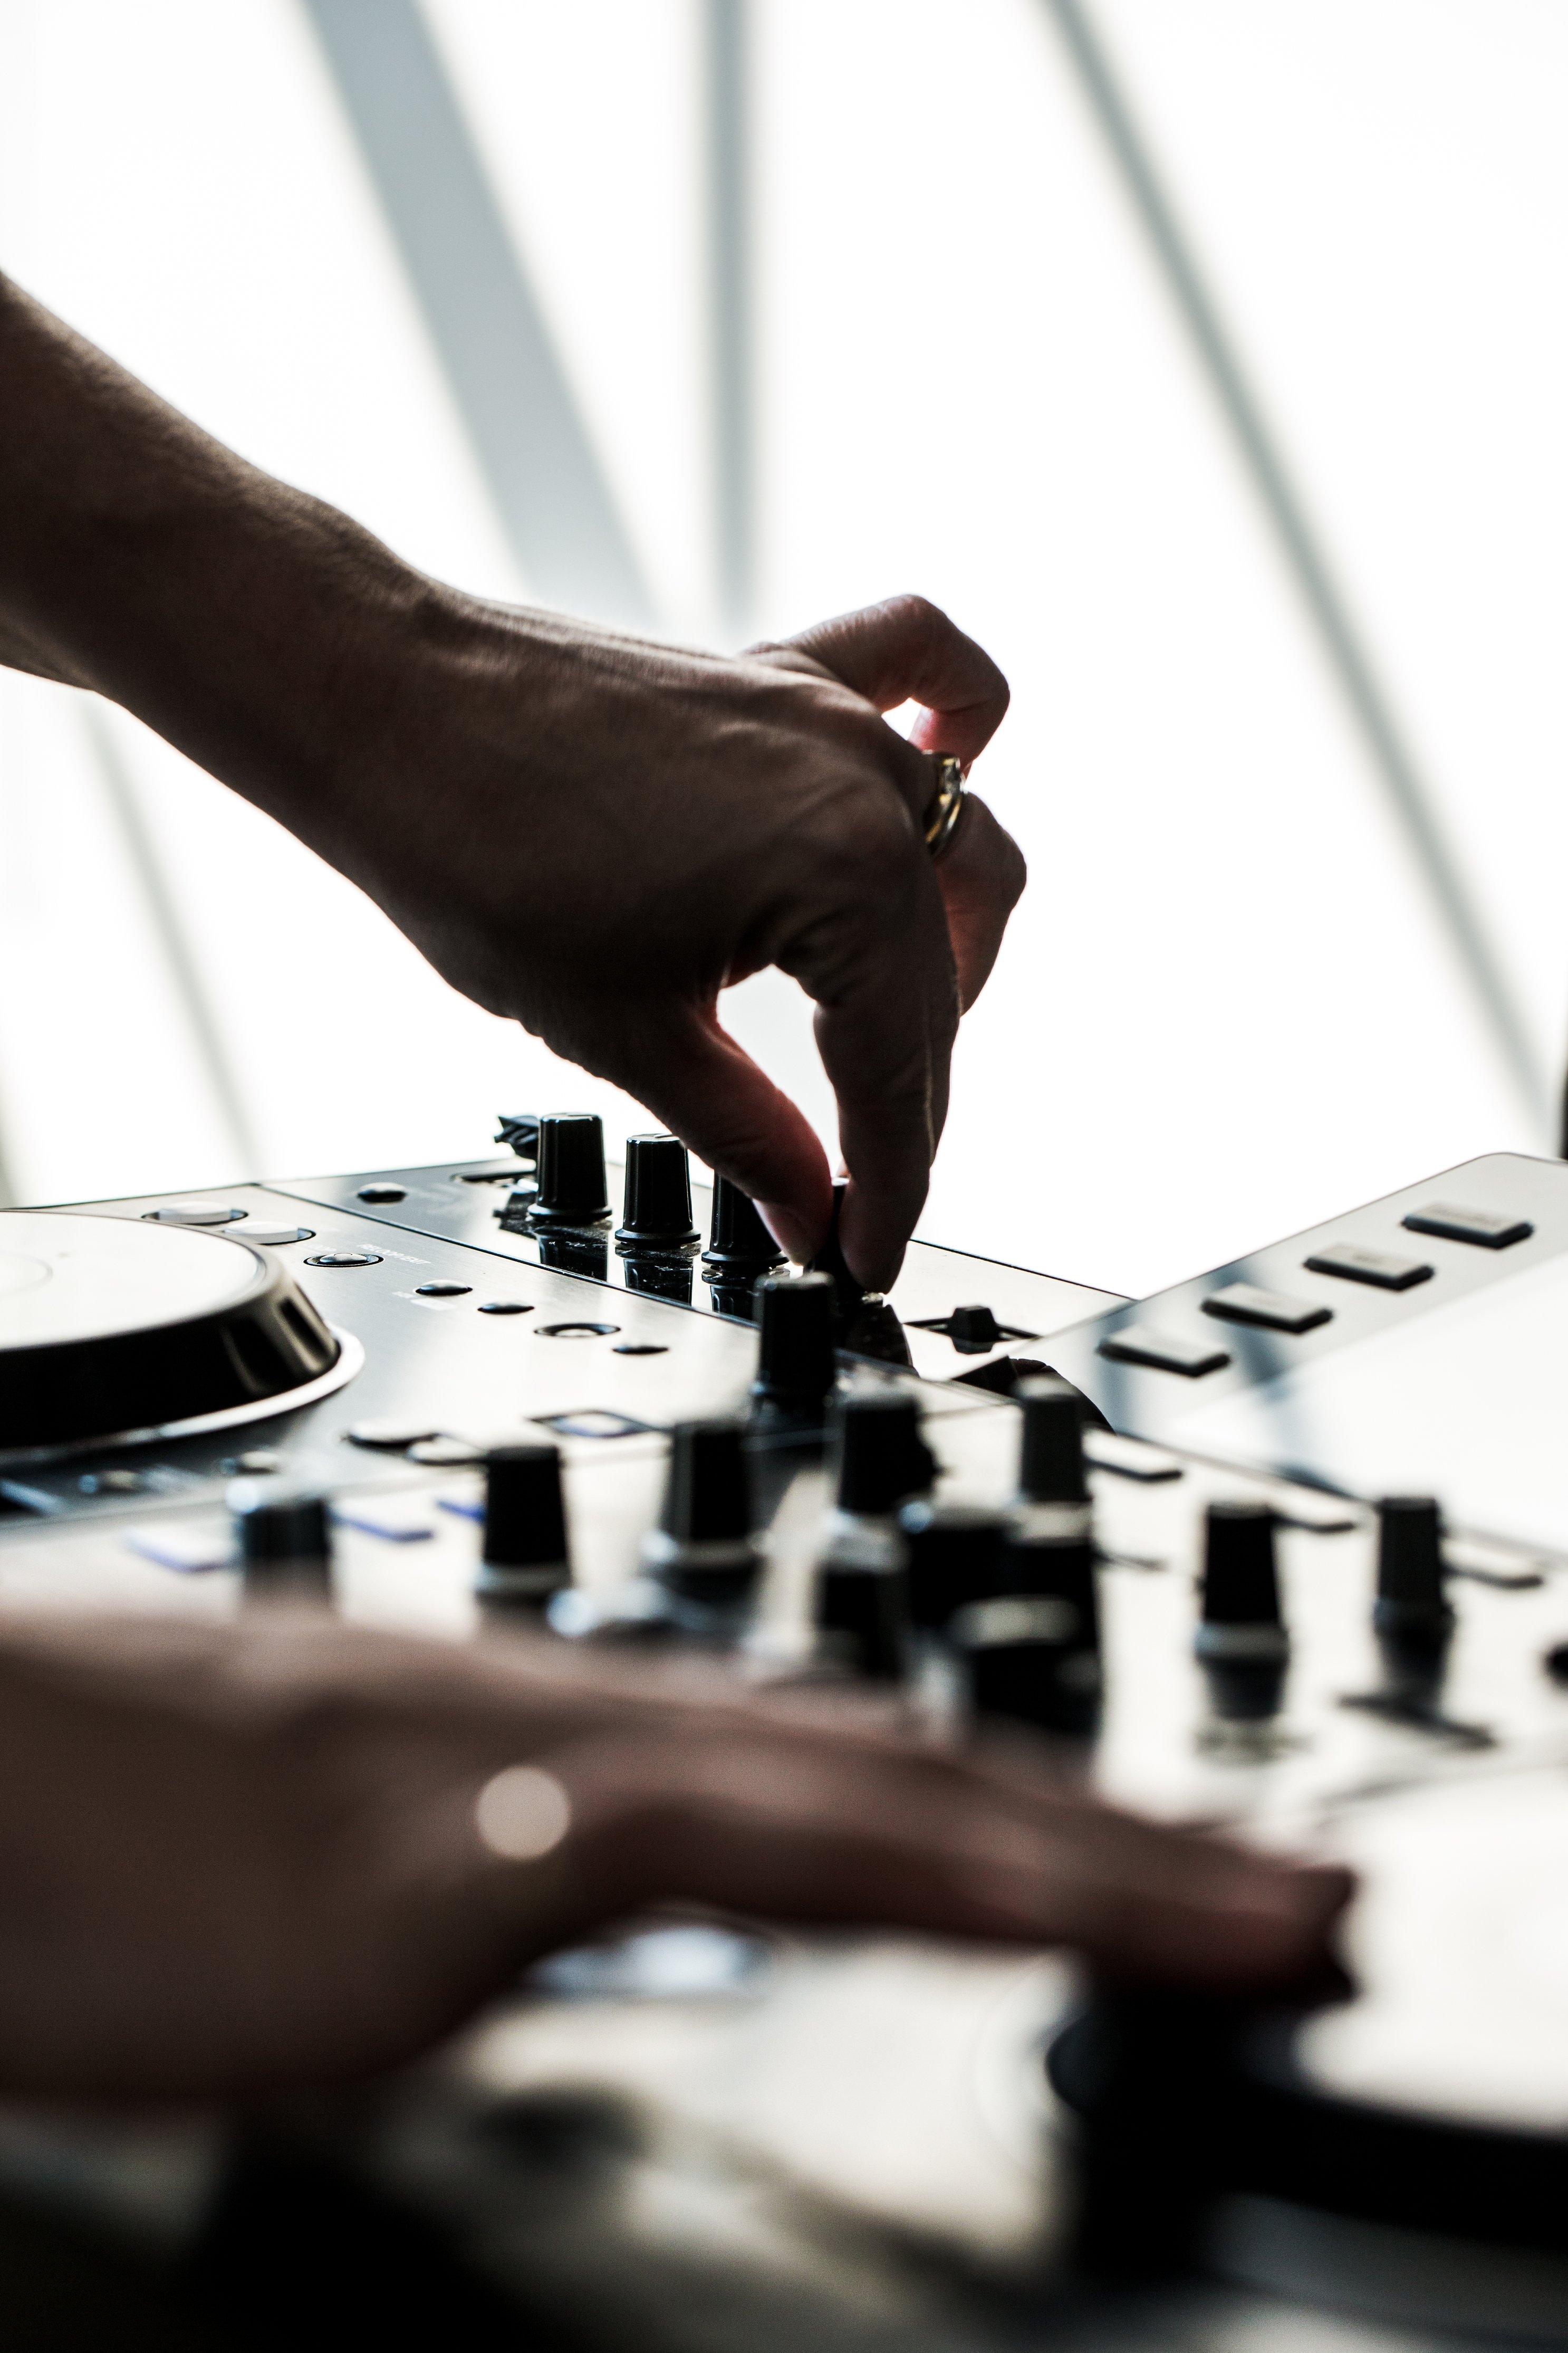 hands-using-dj-board